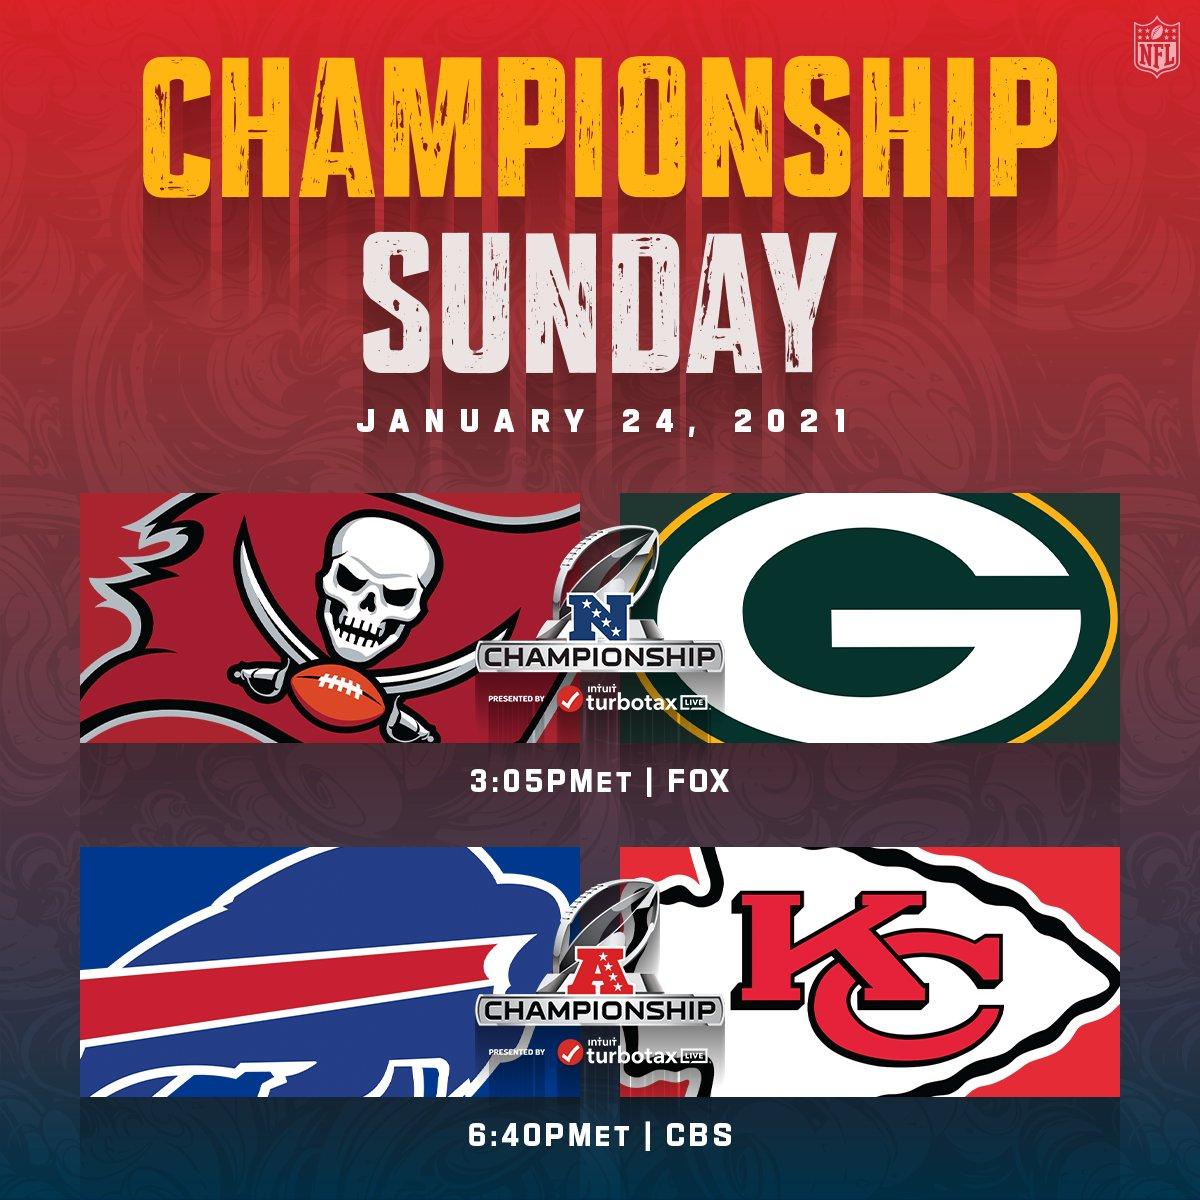 Replying to @NFL: Wake up it's CHAMPIONSHIP SUNDAY! 🏈